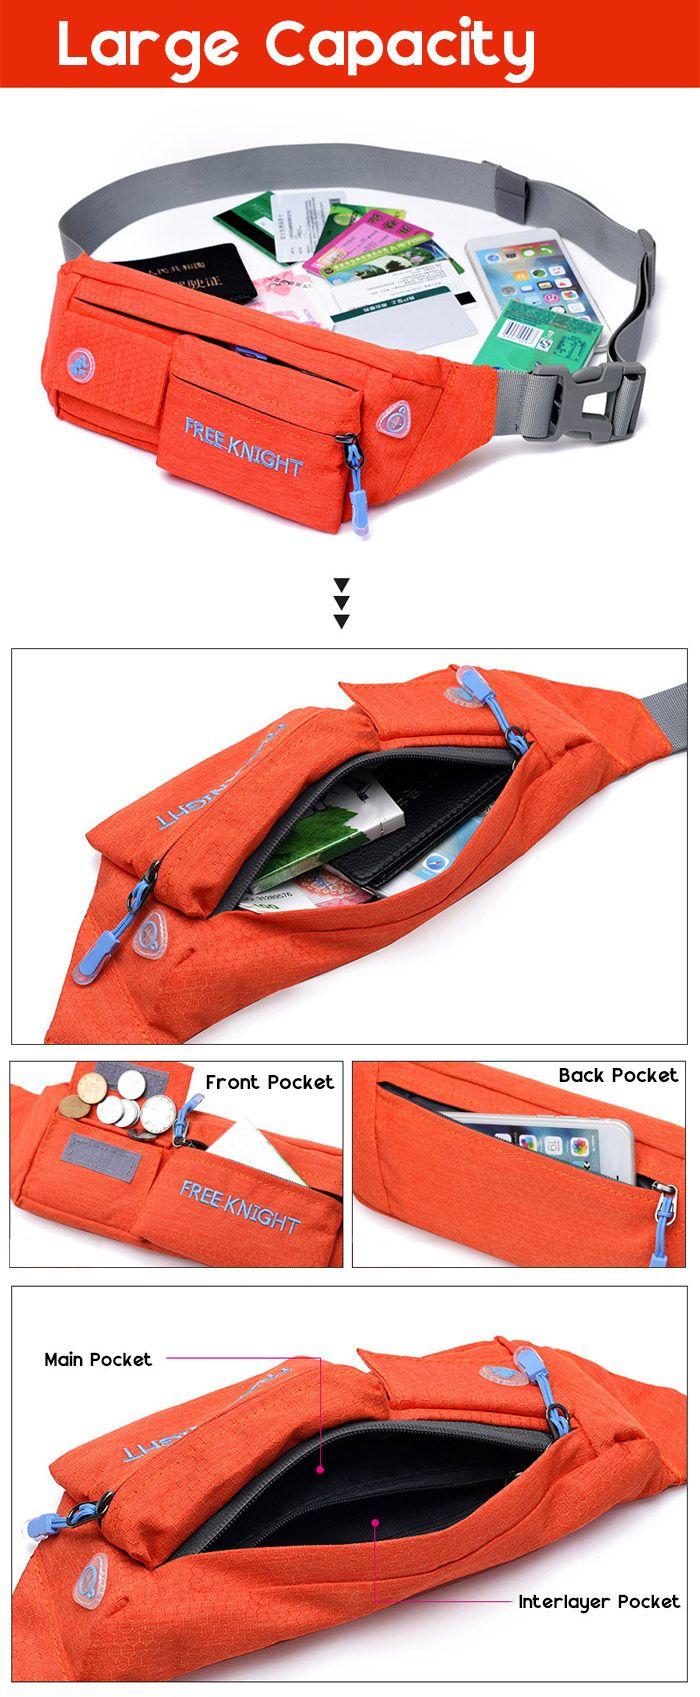 Freeknight Headphone Jack Waterproof Waist Bag